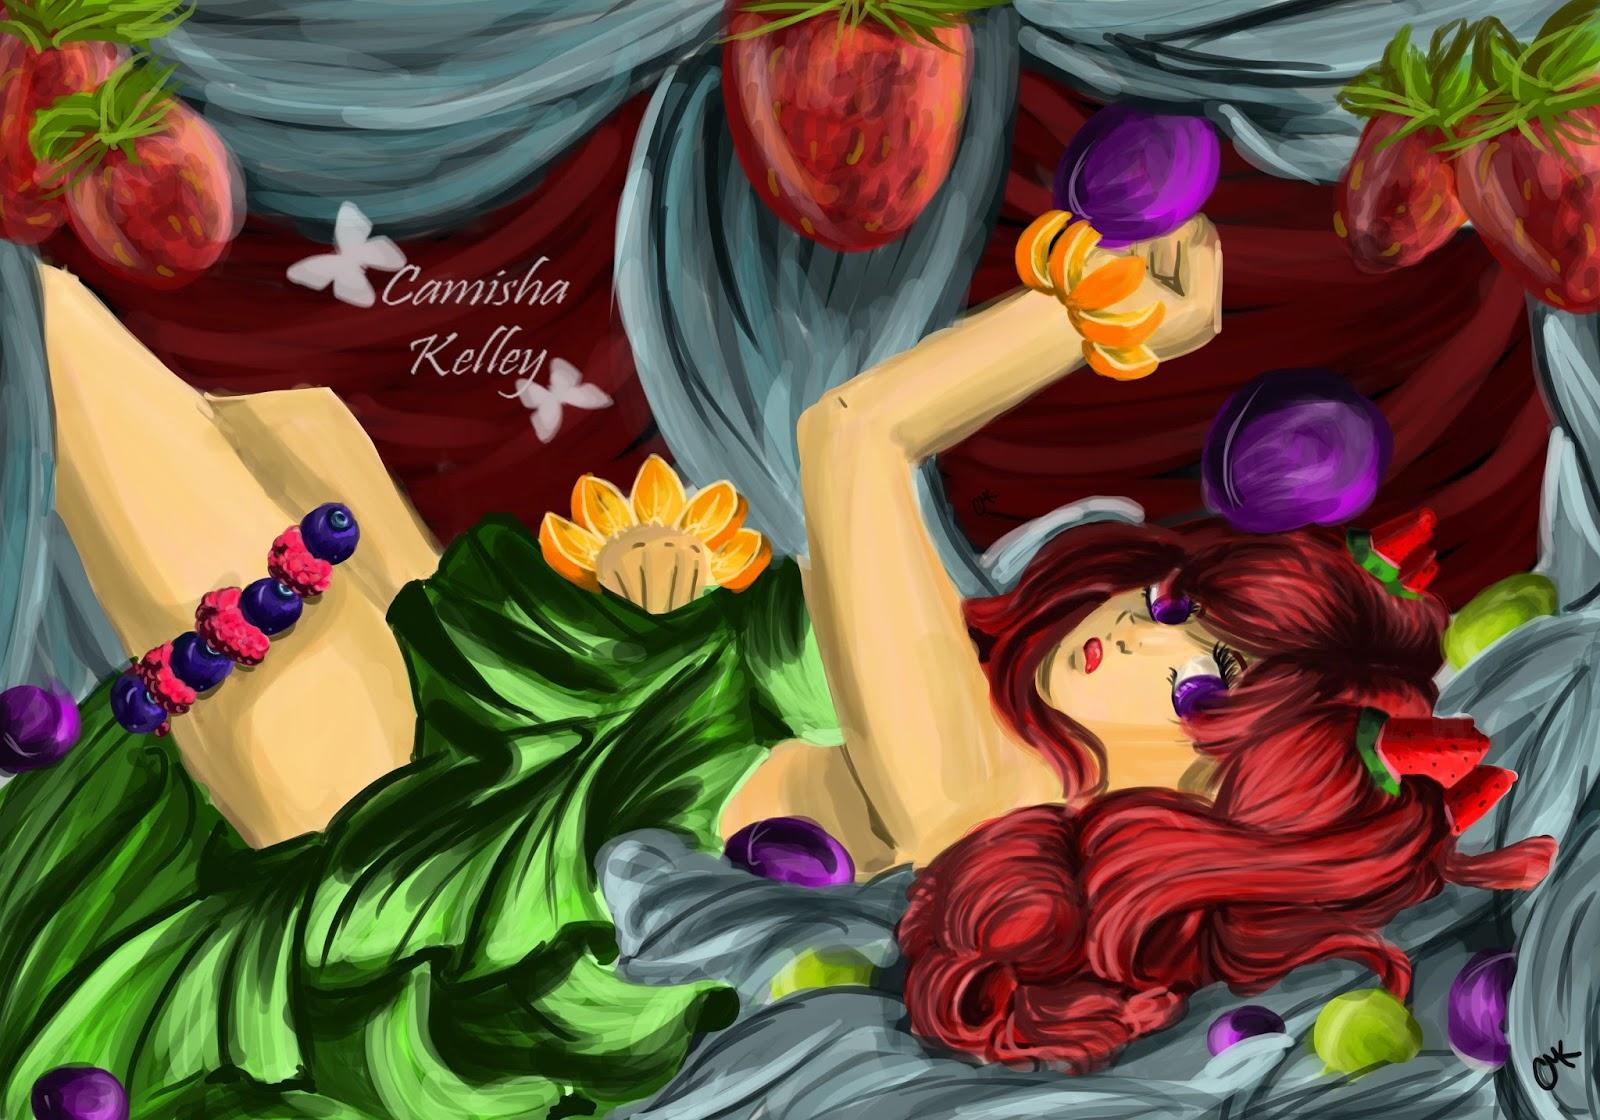 fruit salad inspired illustration